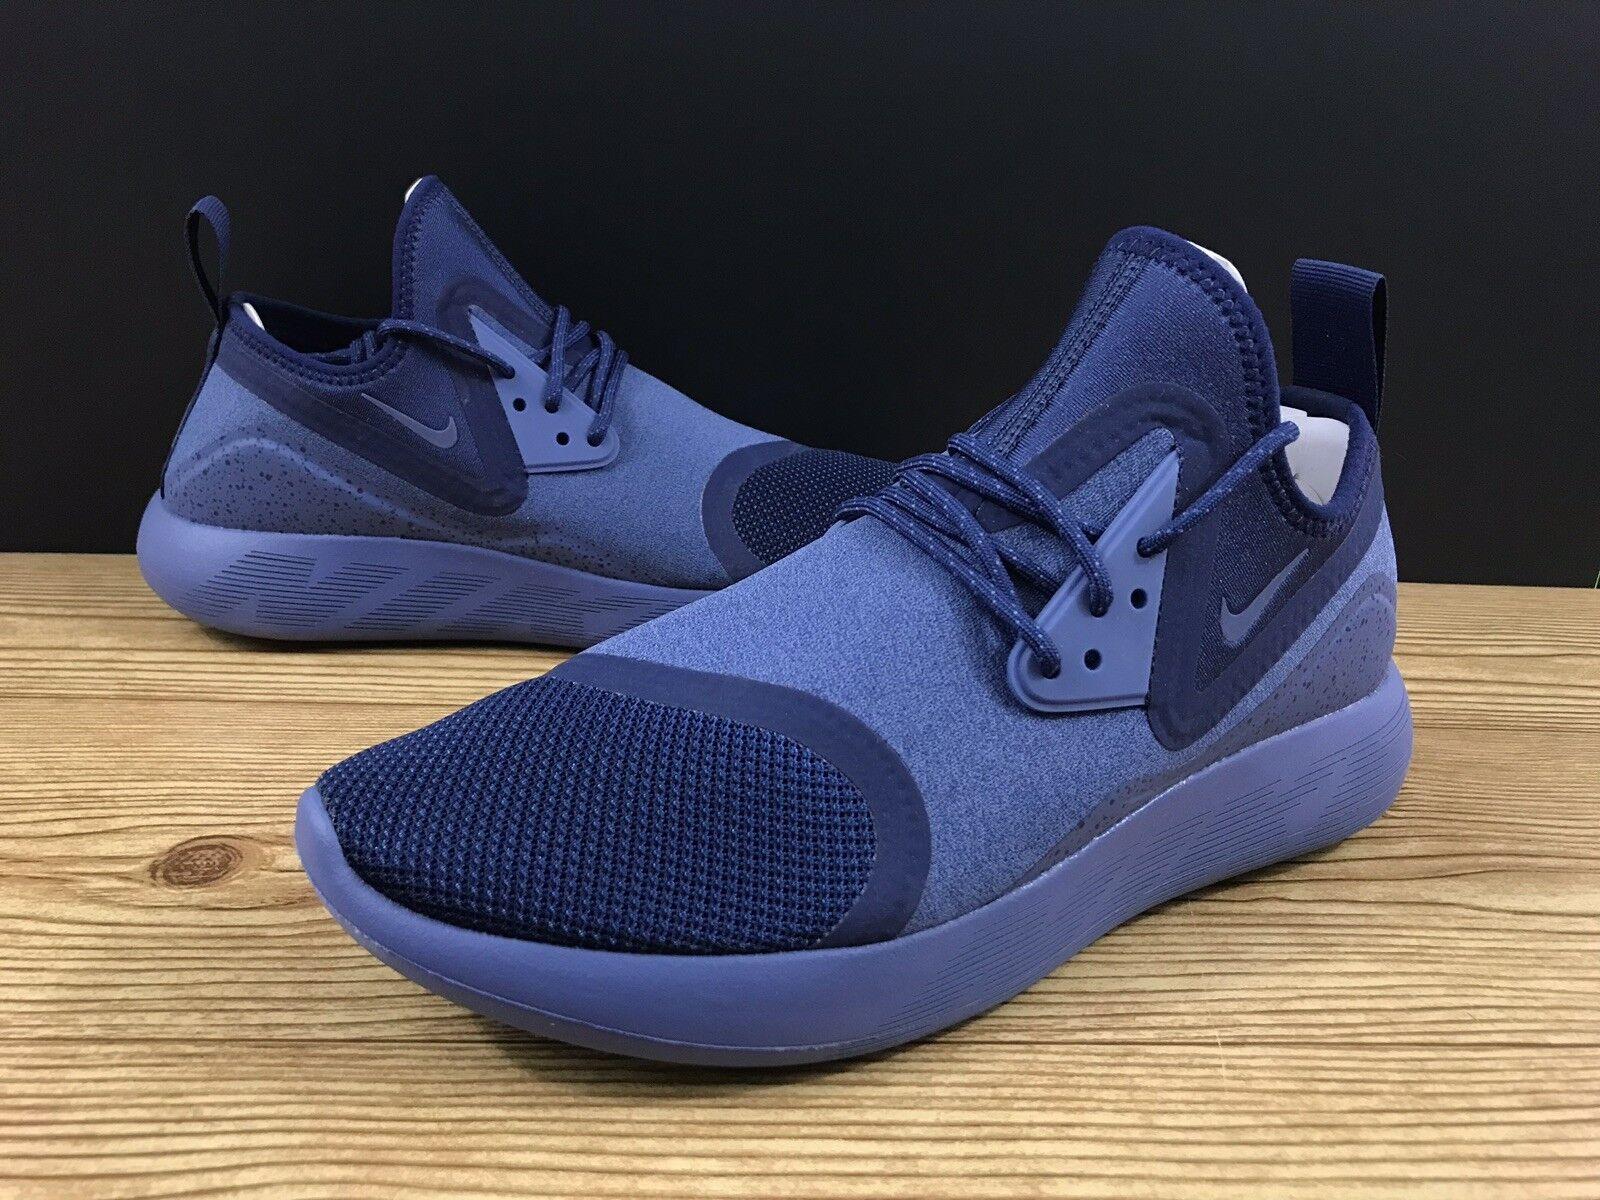 Nike Lunarcharge Essential Mens Sz 9 Running Binary bluee bluee bluee Moon Volt 923619 447 1f9645